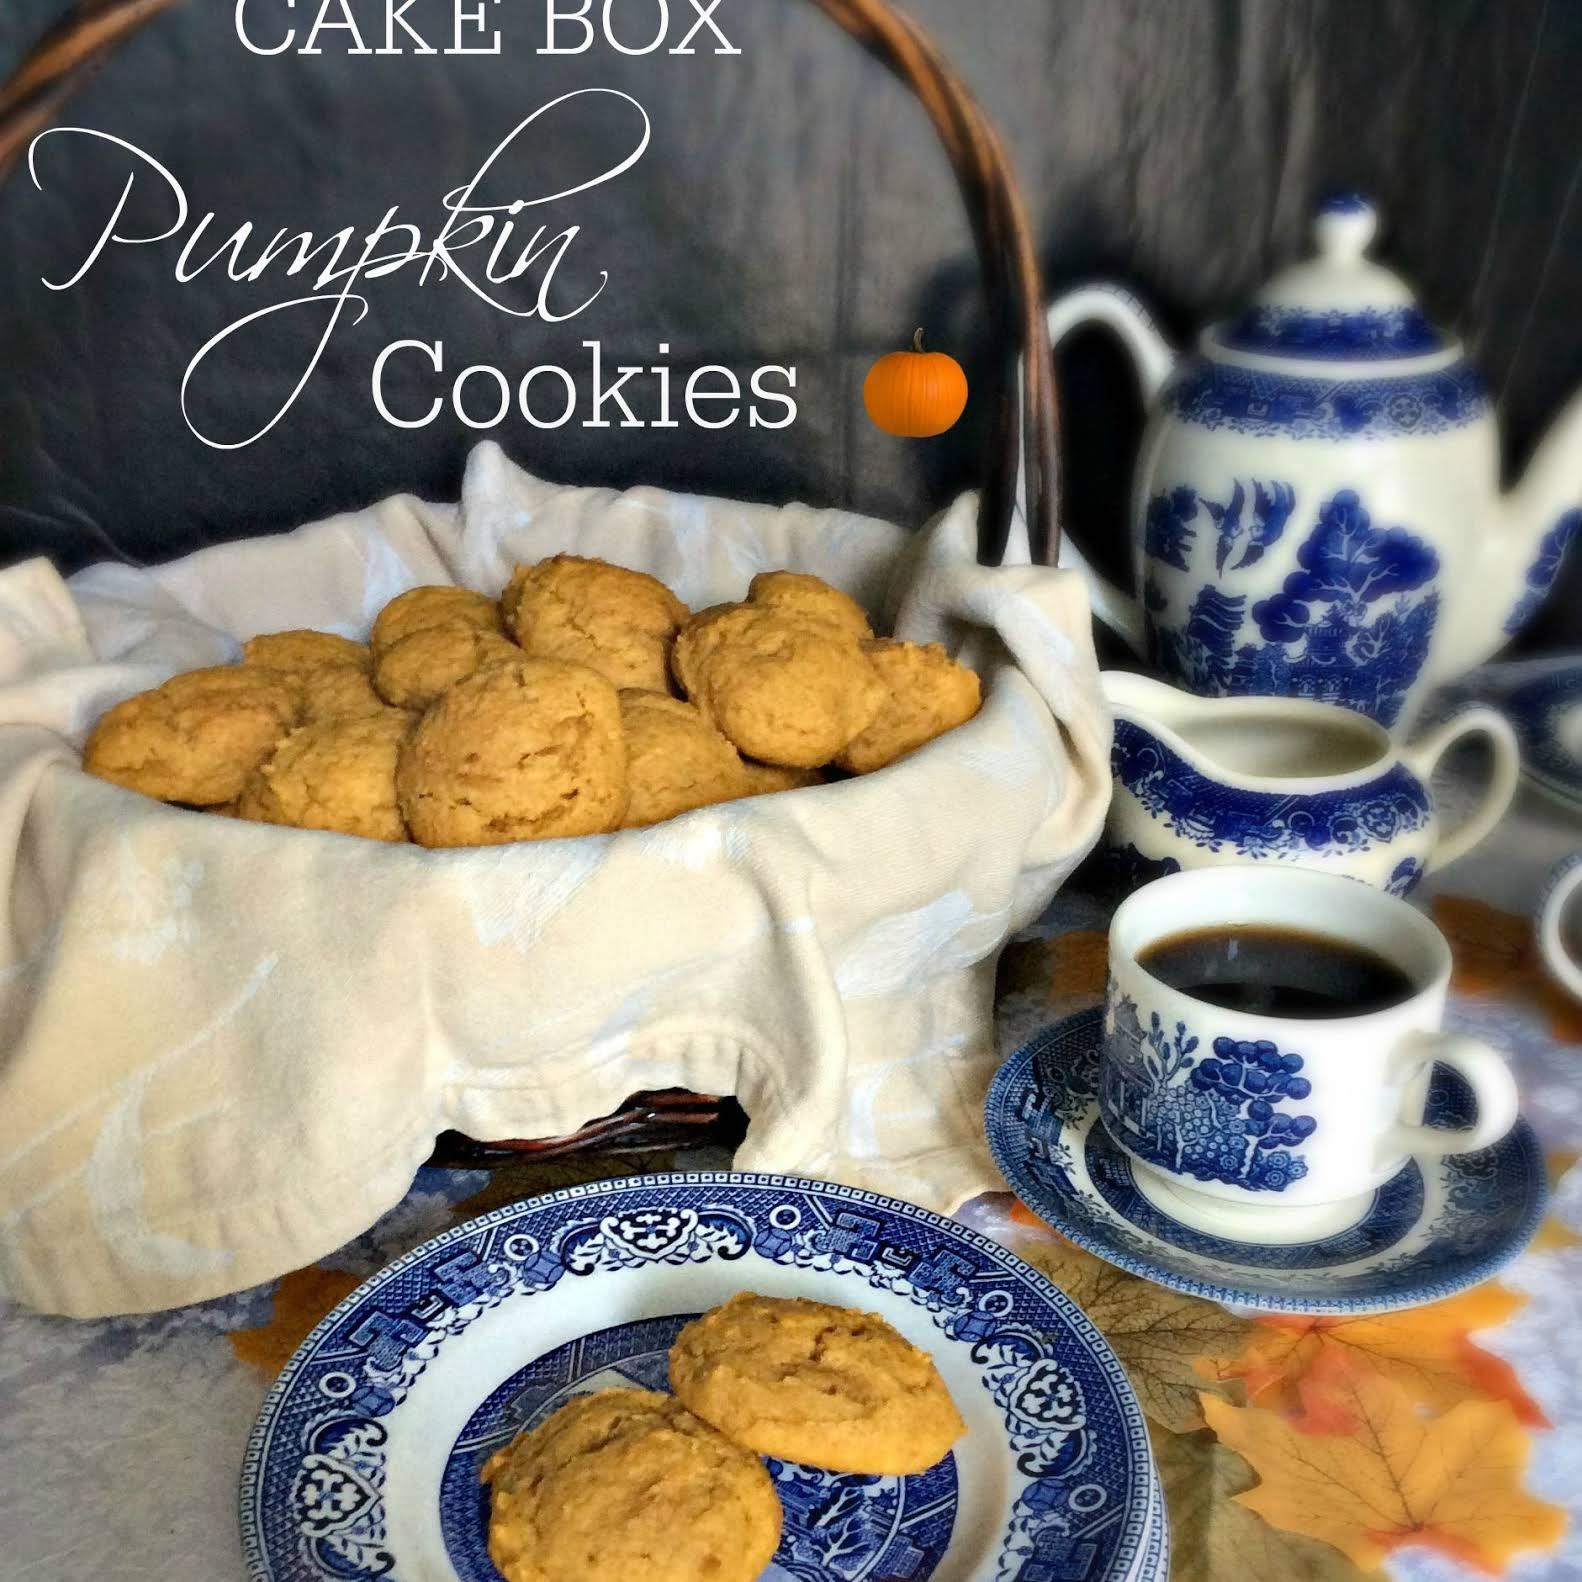 Cake Box Pumpkin Cookies